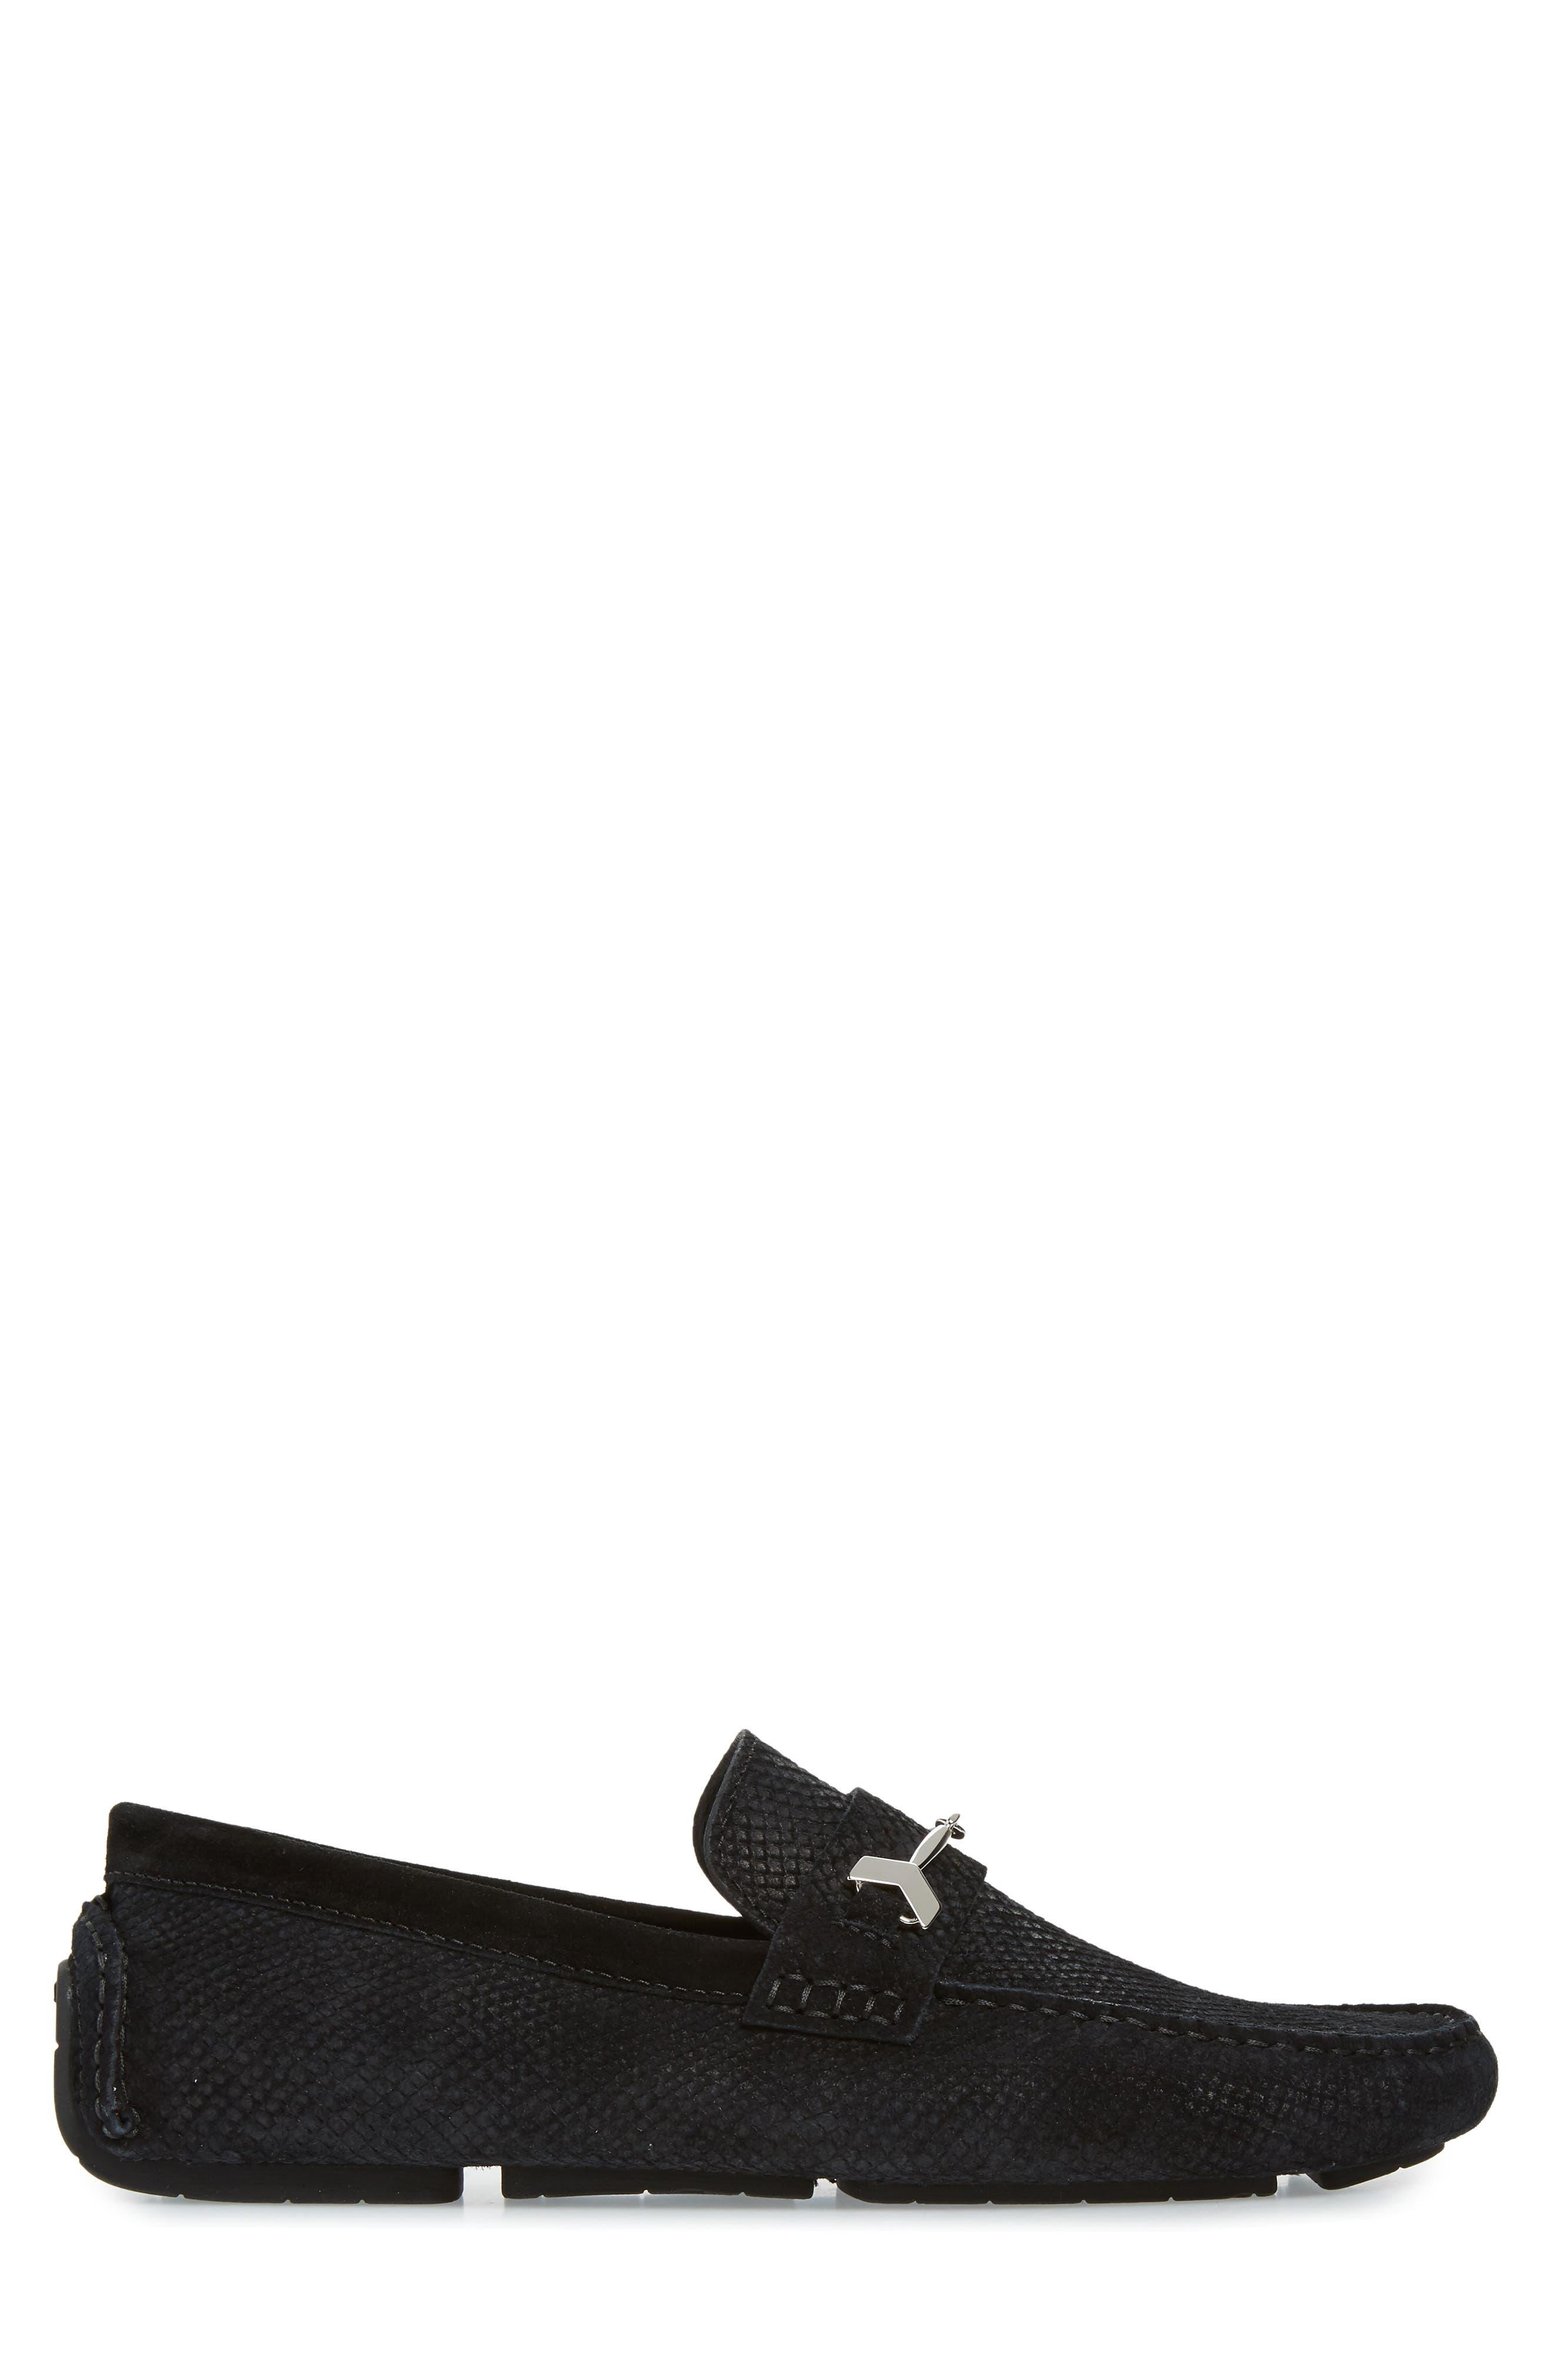 Brewer Croc Textured Driving Loafer,                             Alternate thumbnail 3, color,                             BLACK/BLACK